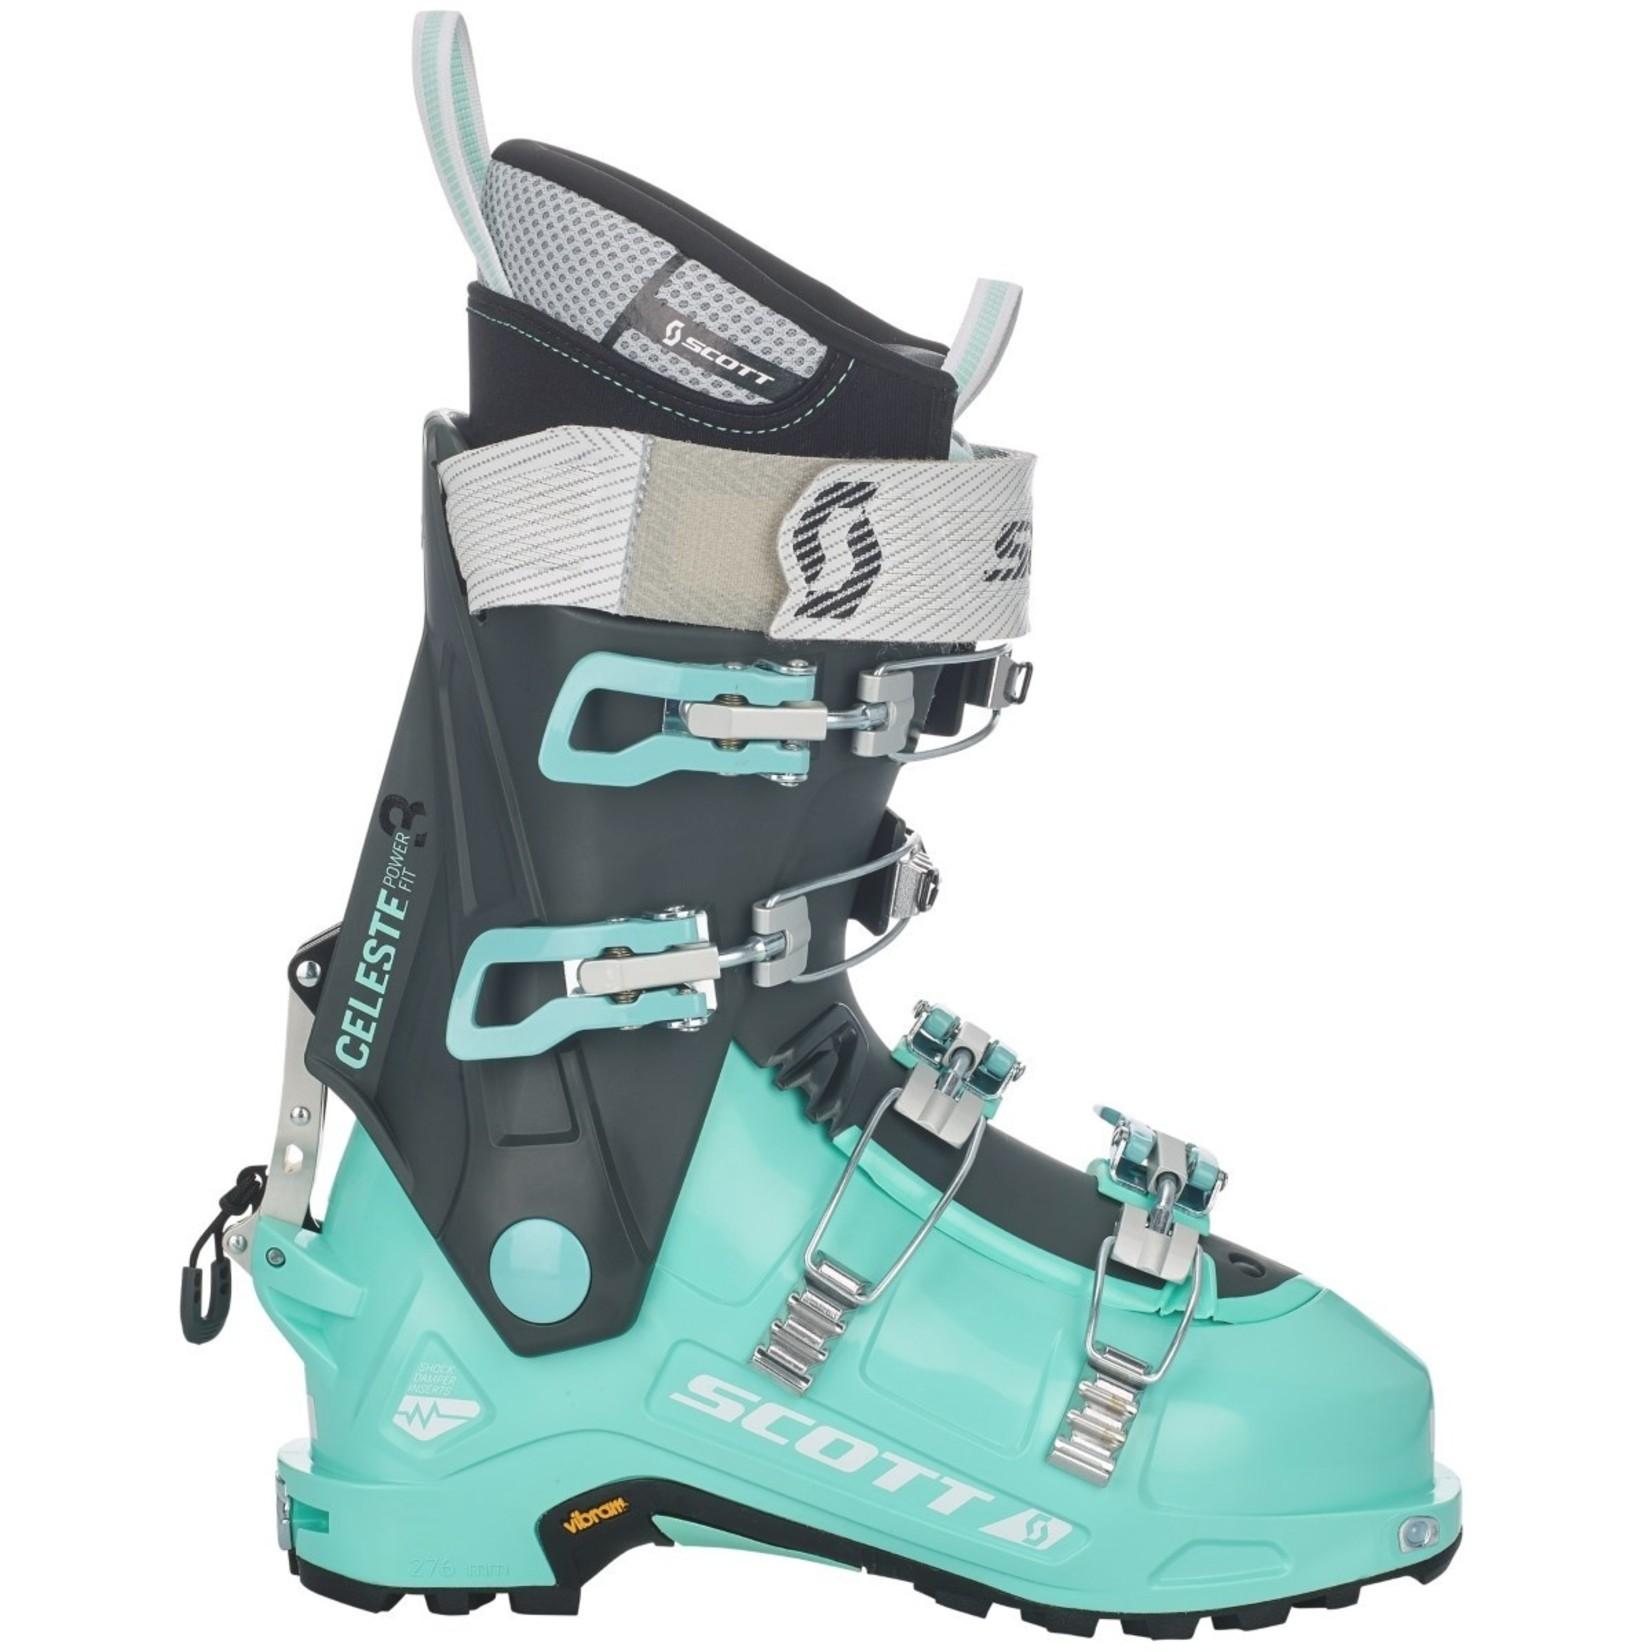 Scott Bottes de ski Scott Celeste III - Femmes